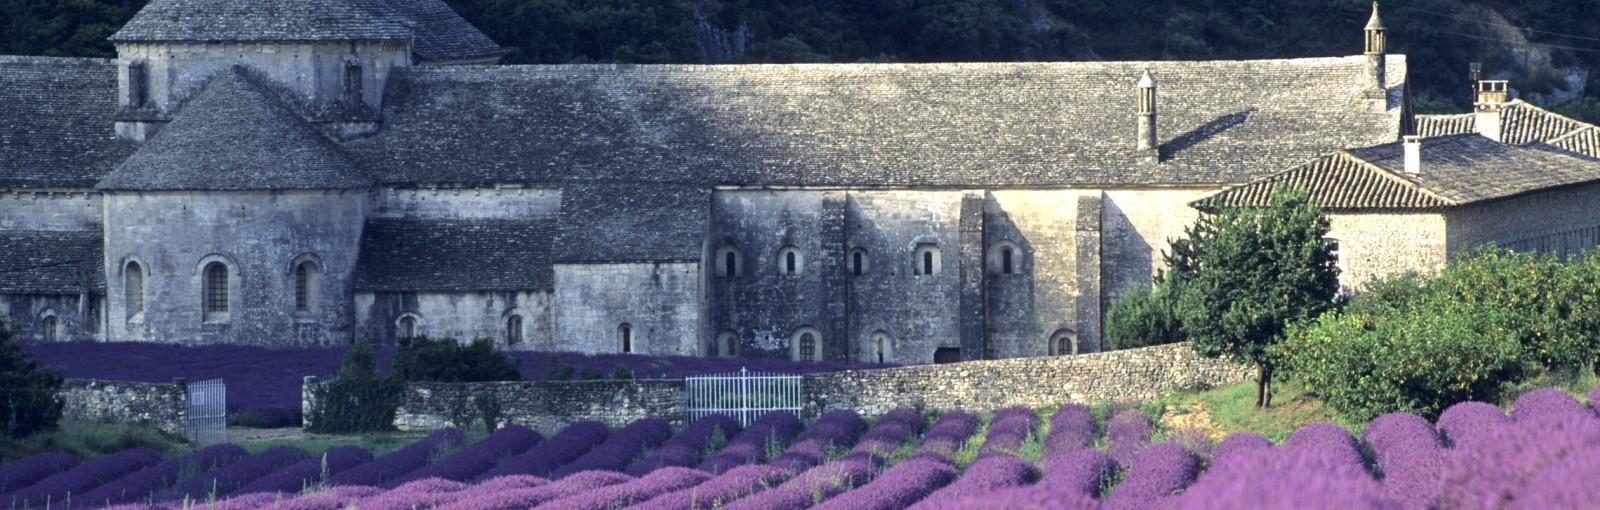 Tours Two days in Provence - Multi-régional - Circuitos desde Paris